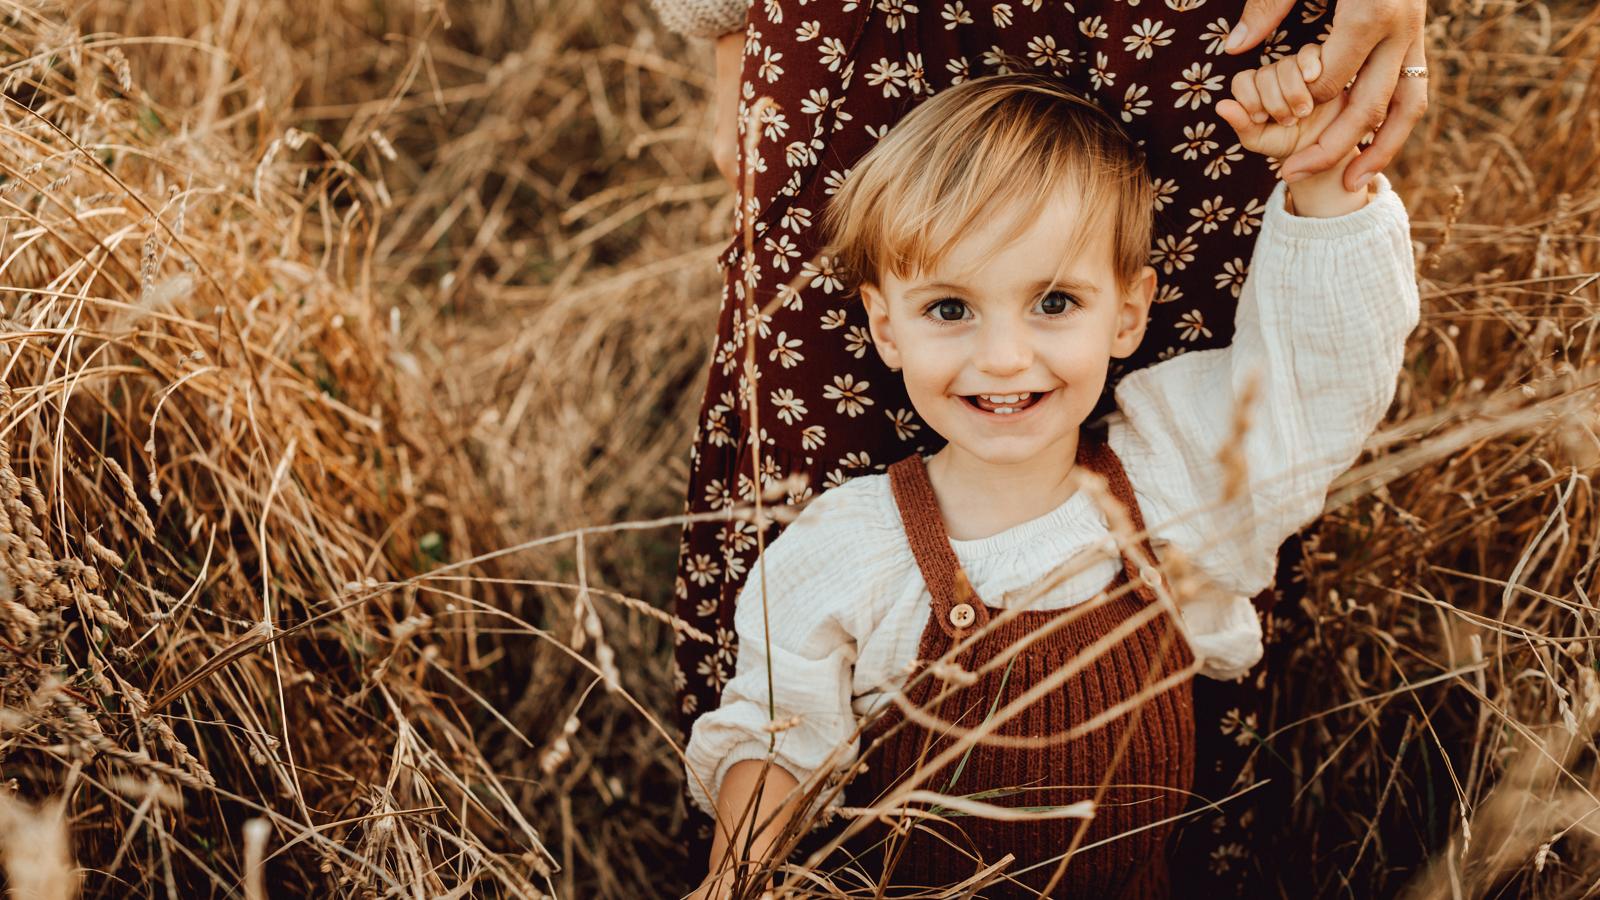 photo petit garçon heureux